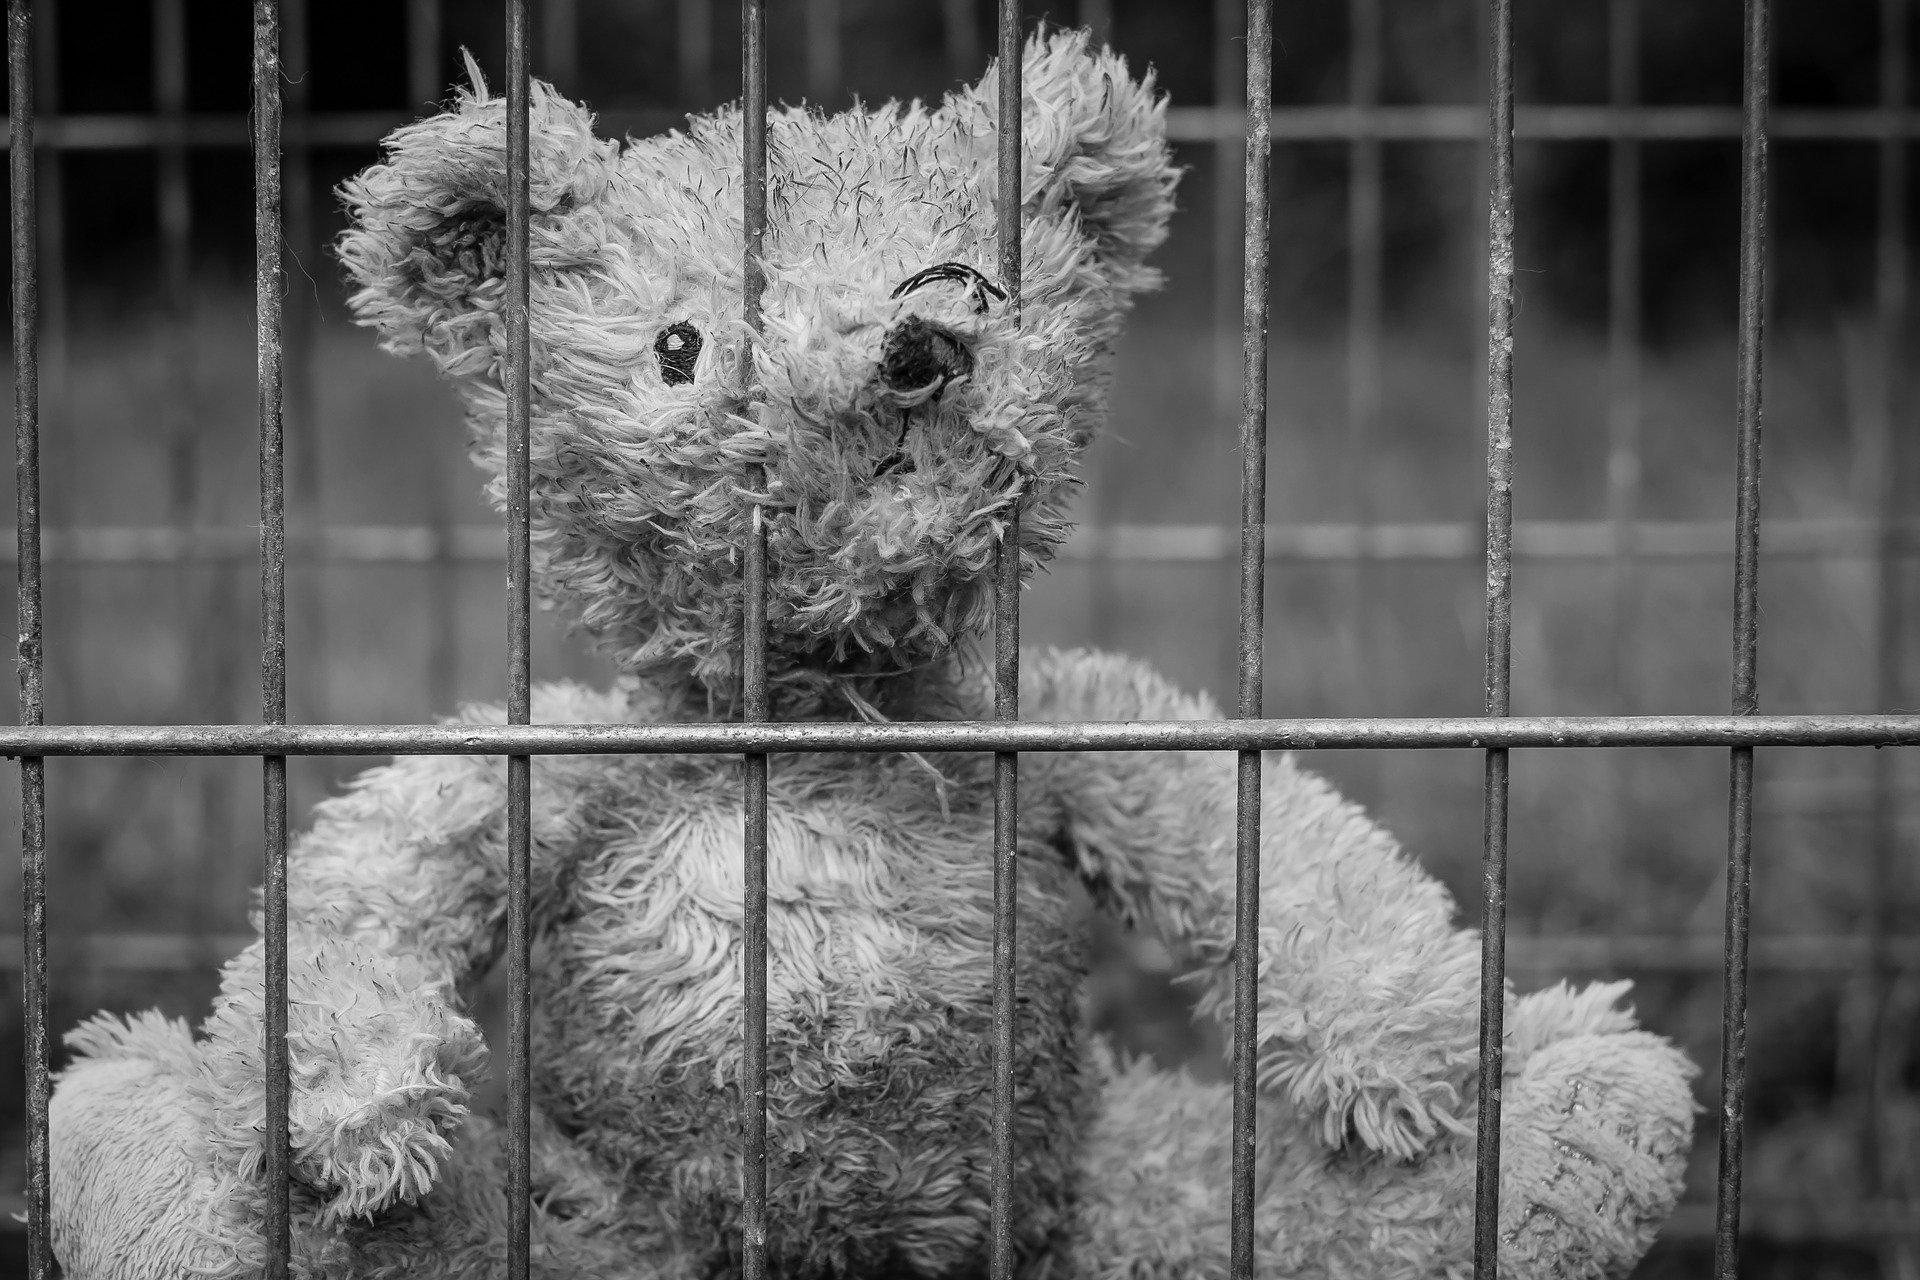 teddy-2711675_1920